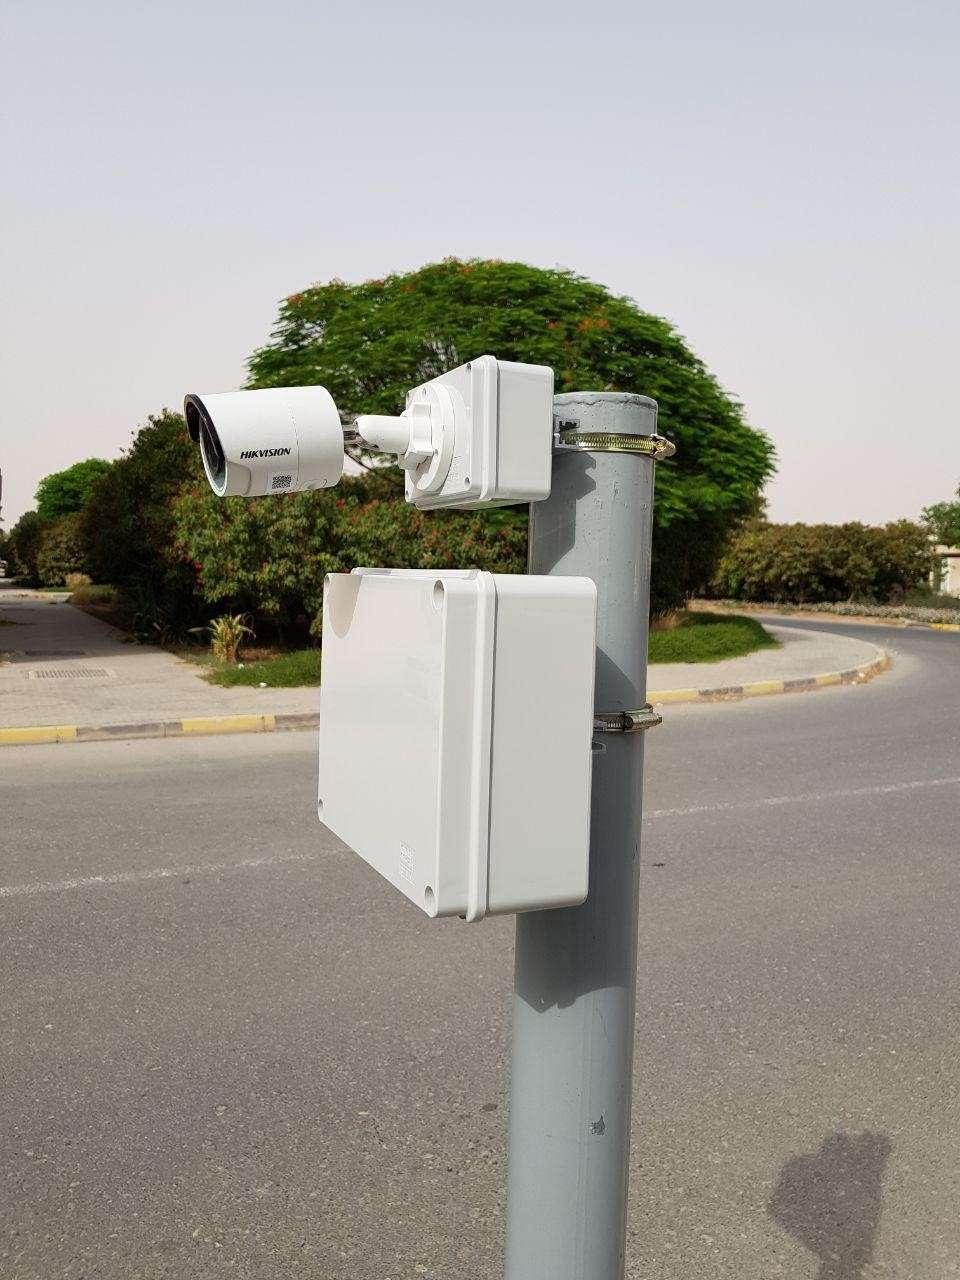 traffic enforcement camera